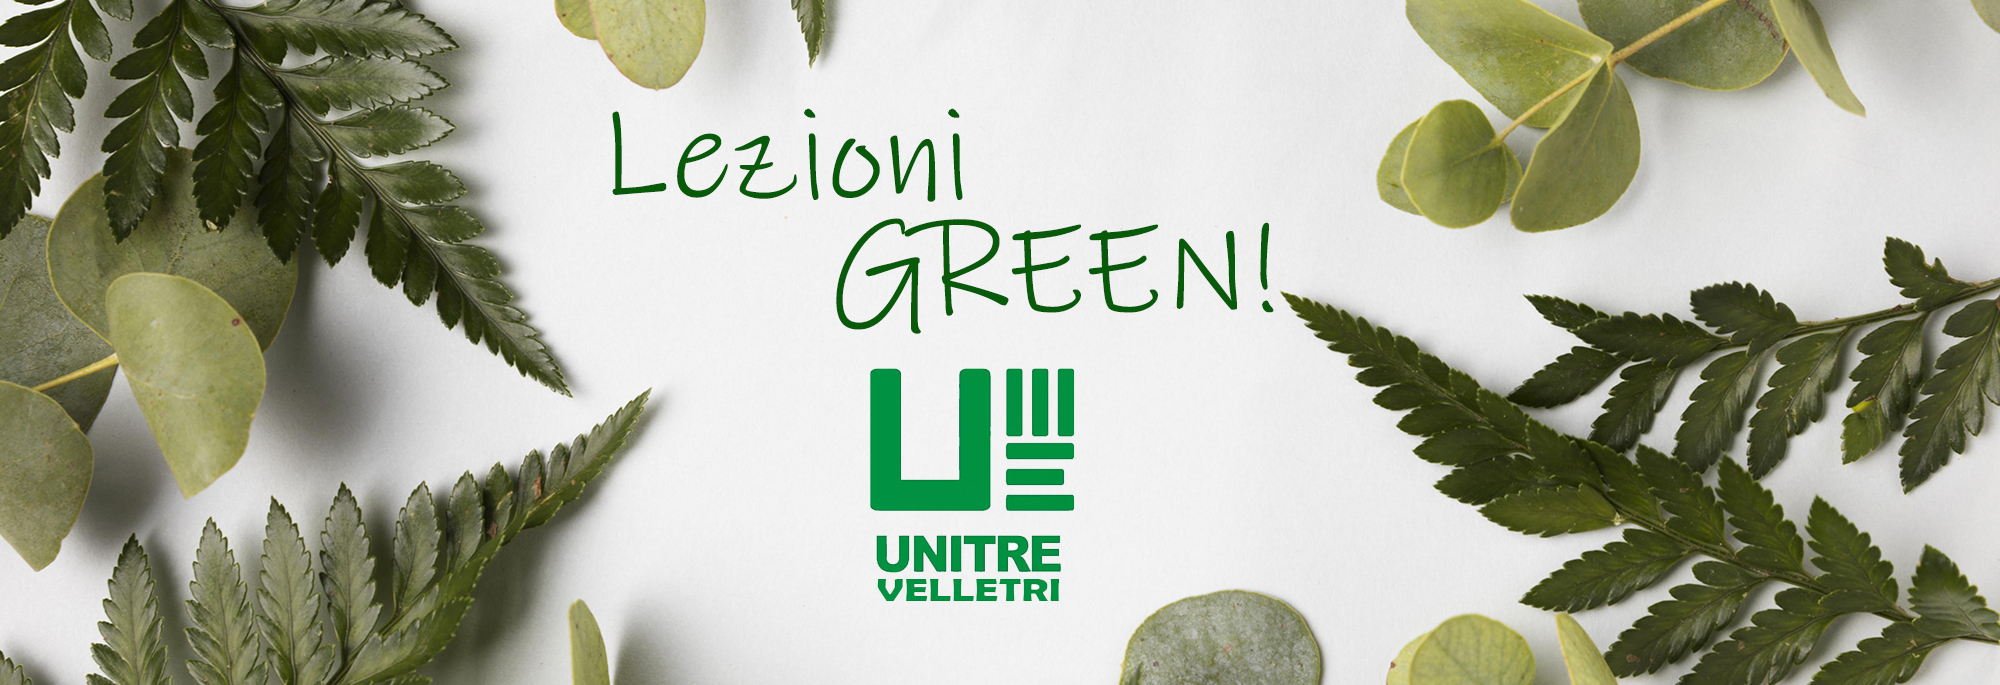 Unitre Velletri – Lezioni Green!